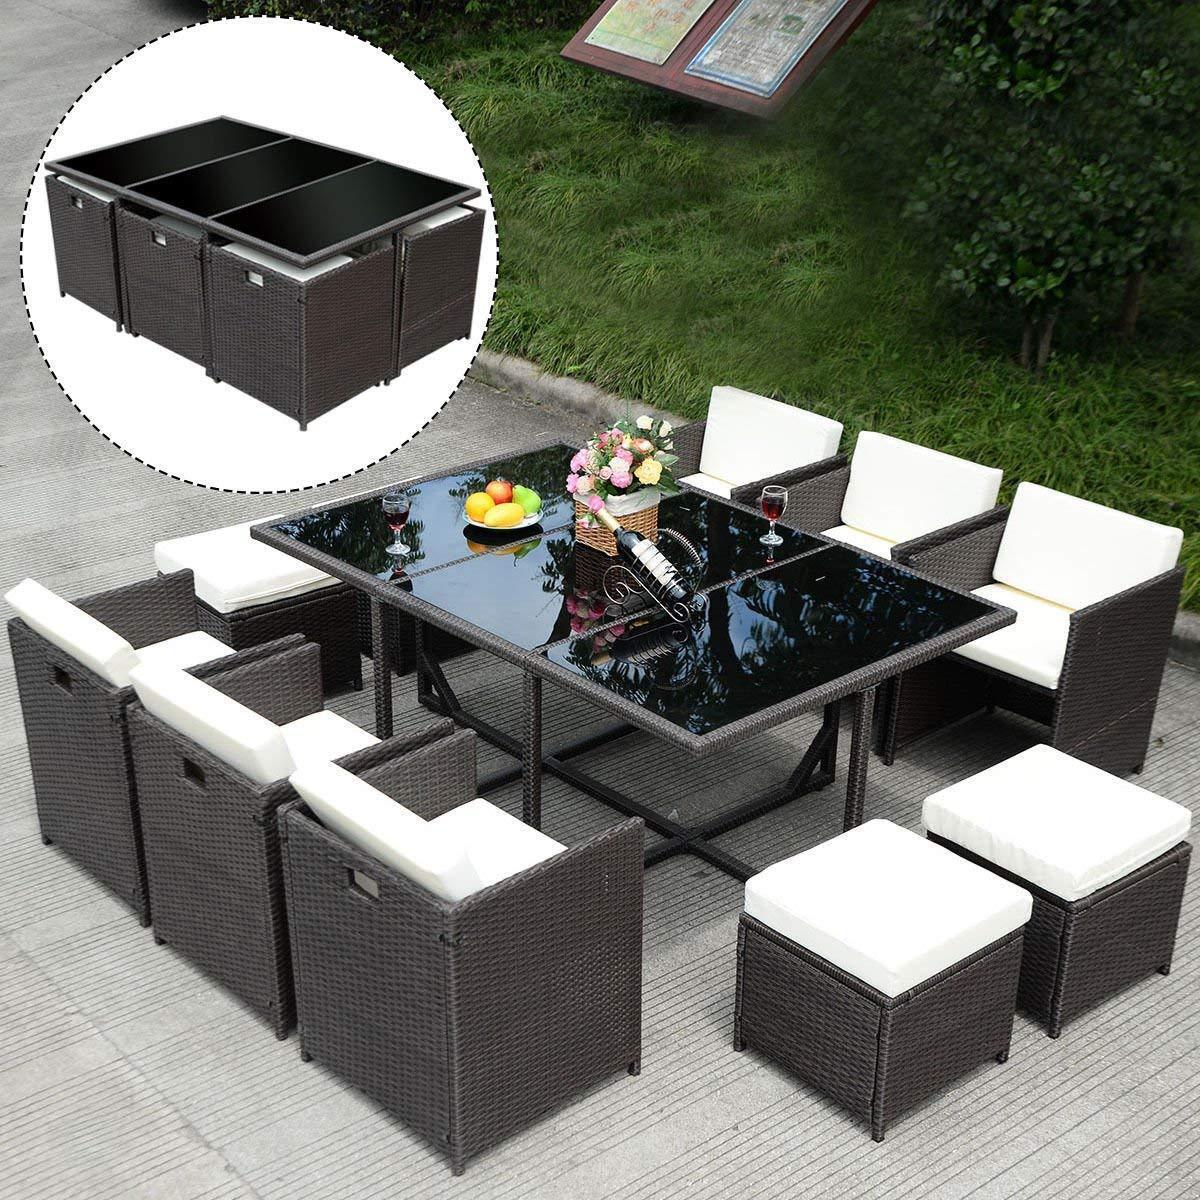 Garden Furniture - Patio Furniture Outdoor Wicker Rattan Dining Set Cushioned Seat Garden Sectional